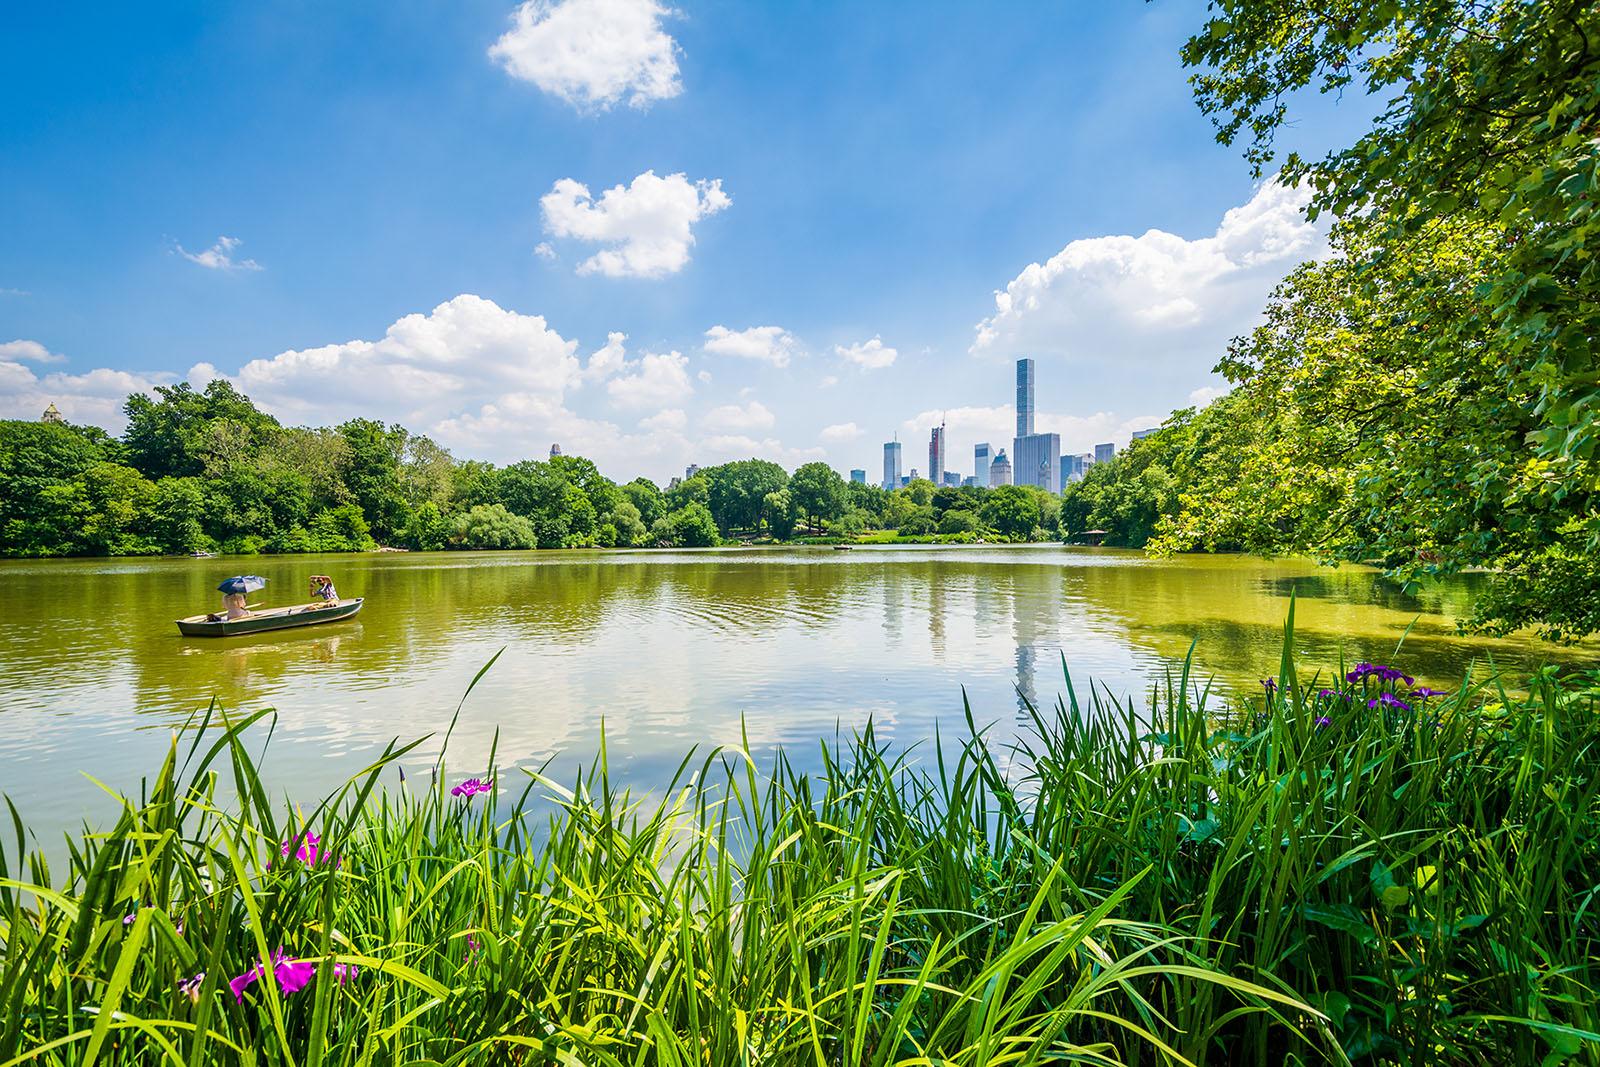 Seneca Village: The African-American Village Underneath Central Park